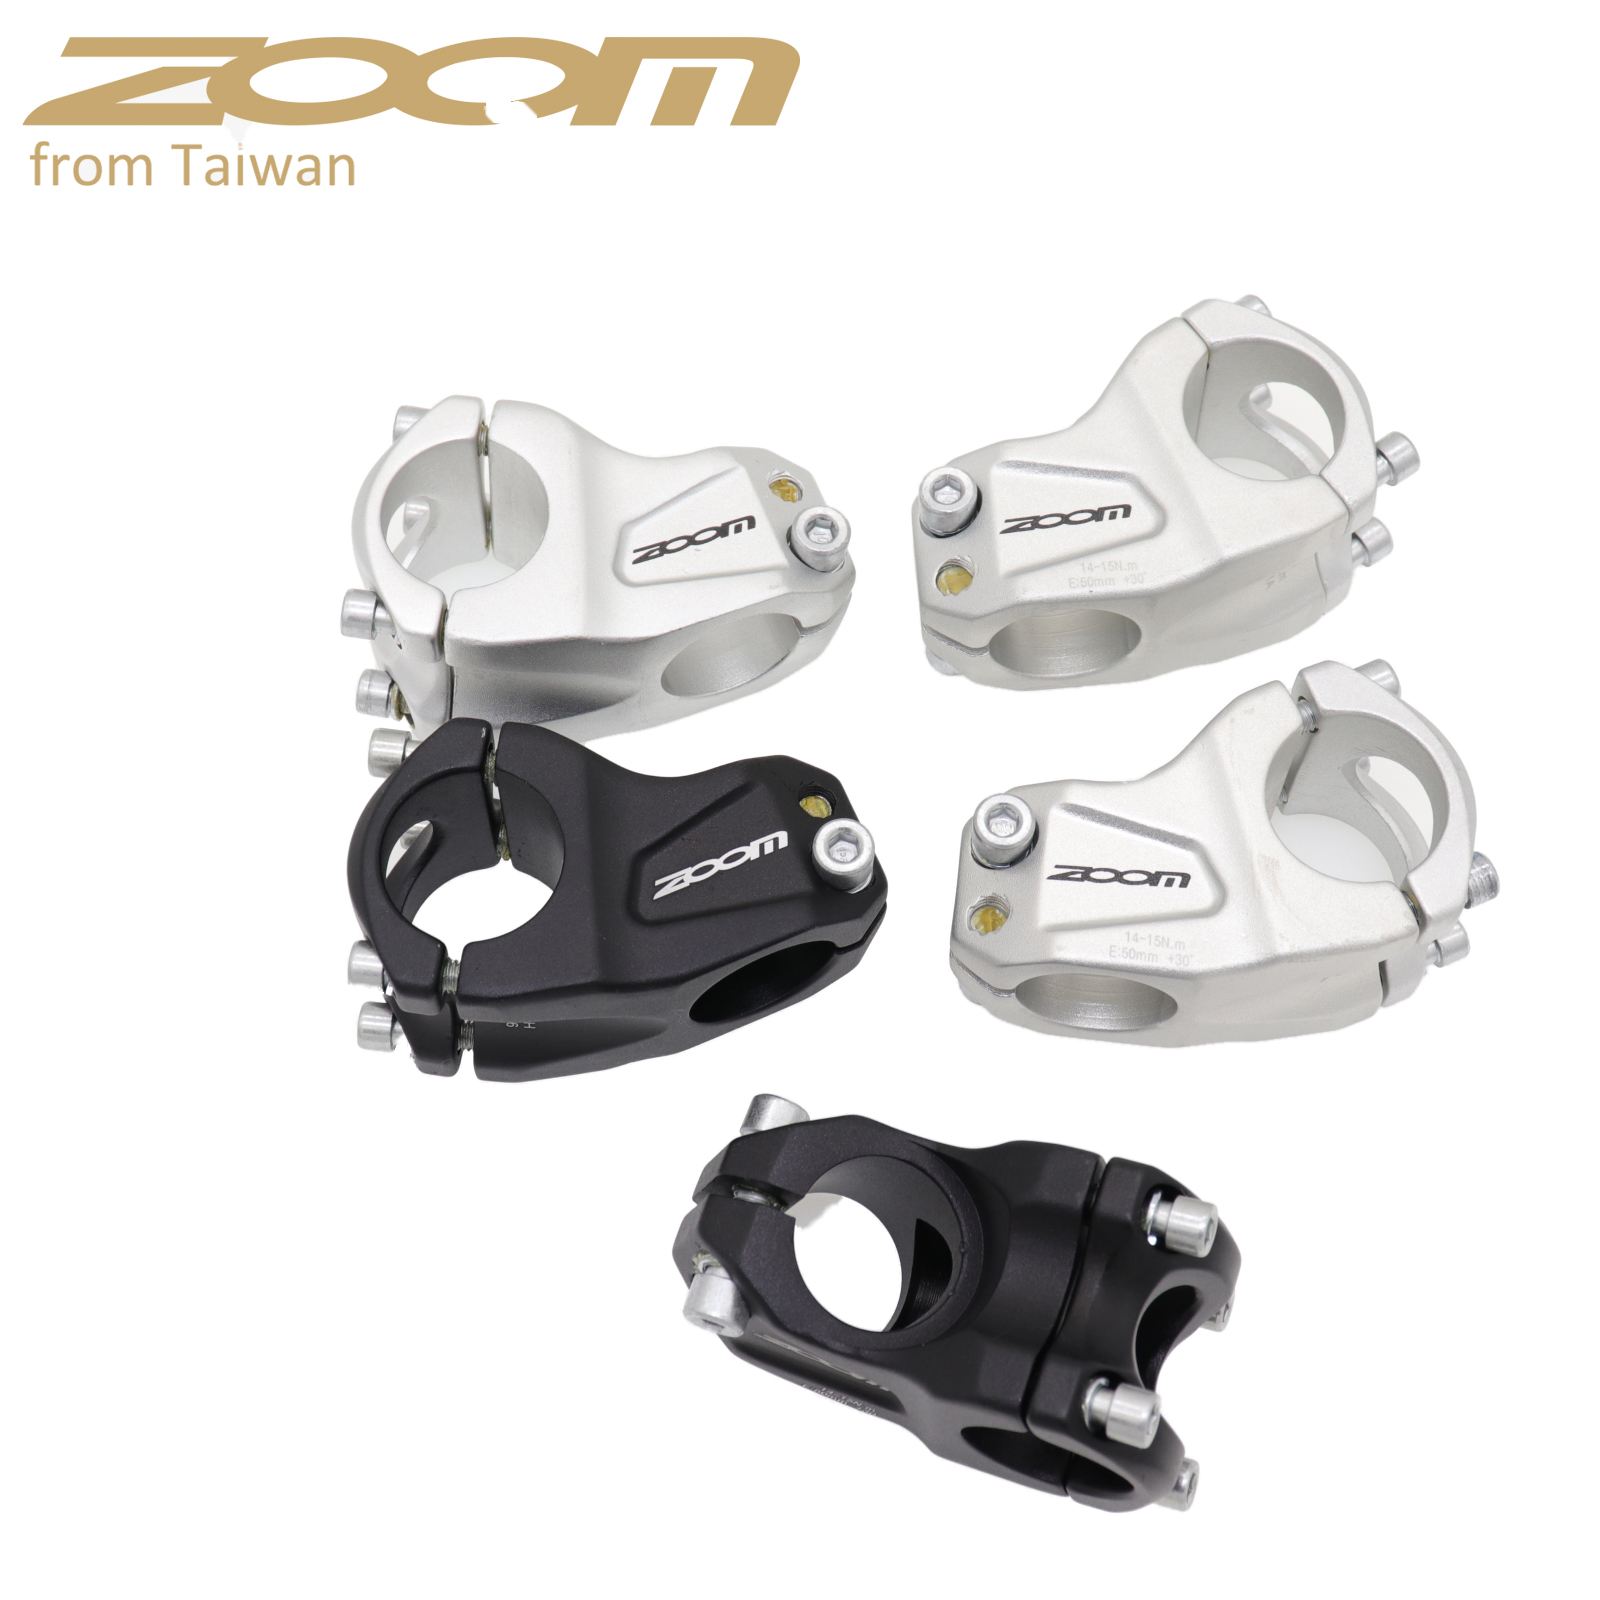 ZTTO DH Downhill MTB Mountain Bike Stem-0 Degree Deg 50MM 31.8MM Handlebars Stem